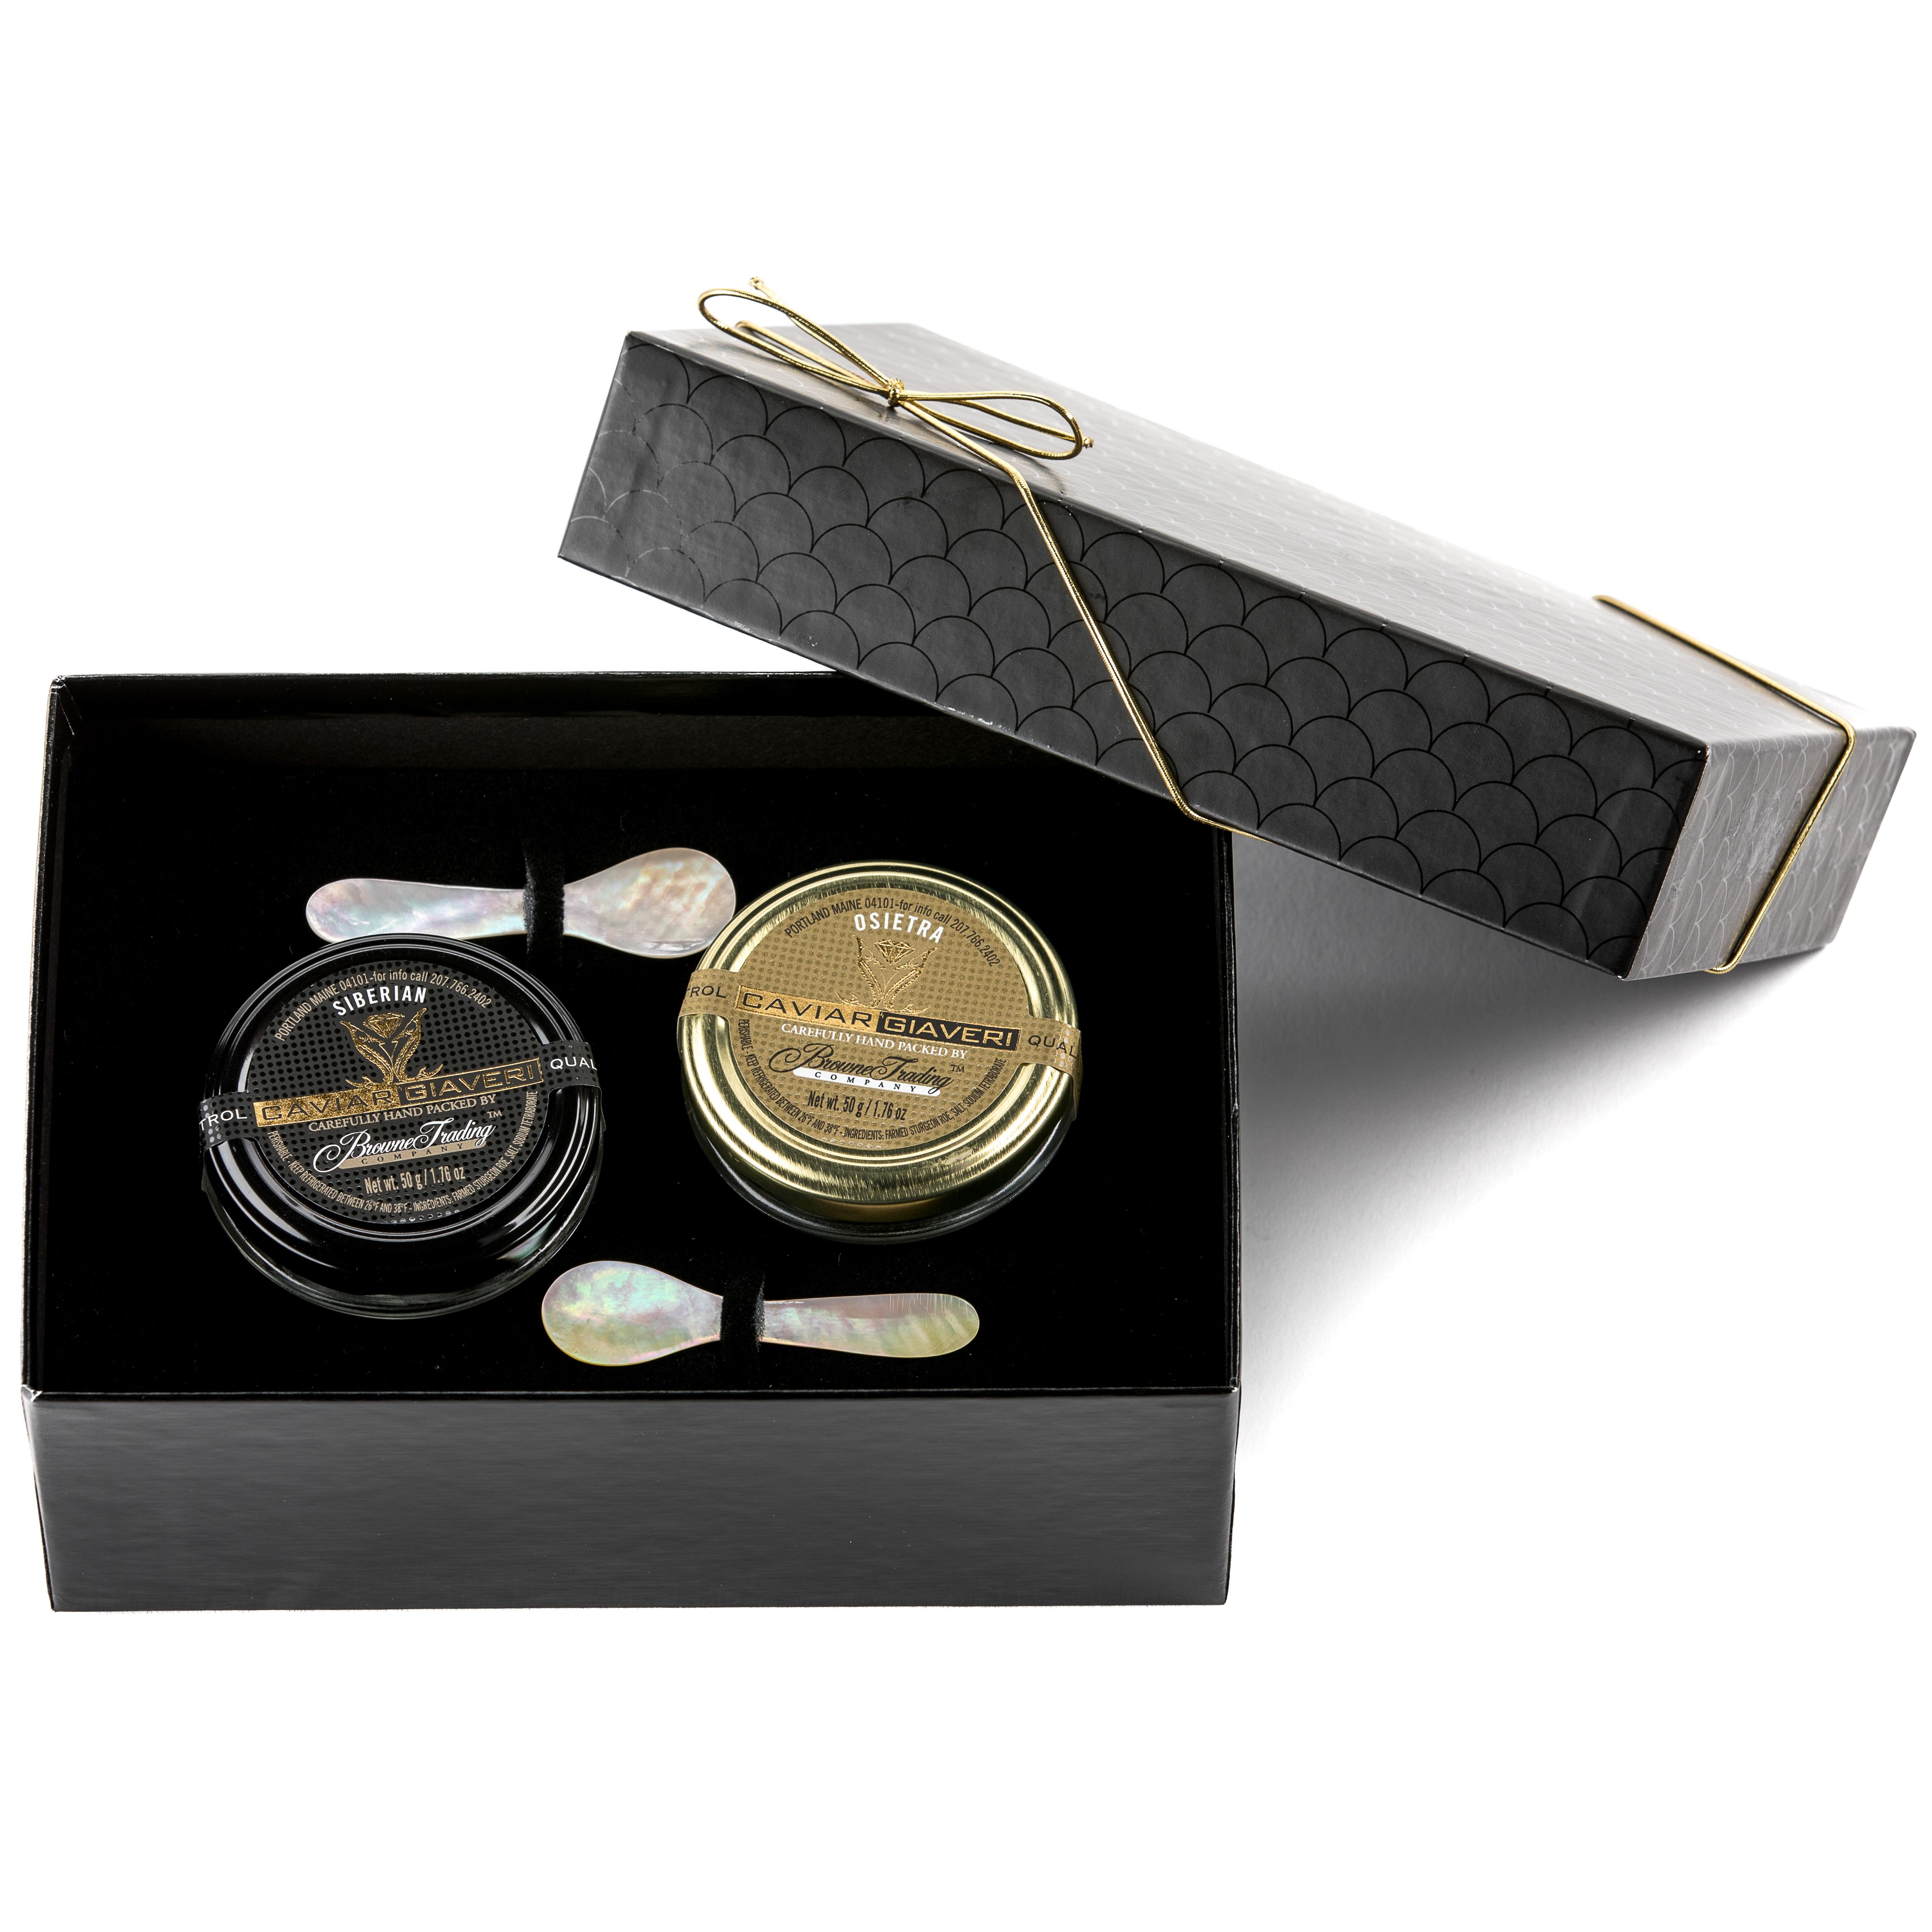 Italian Caviar Gift Set